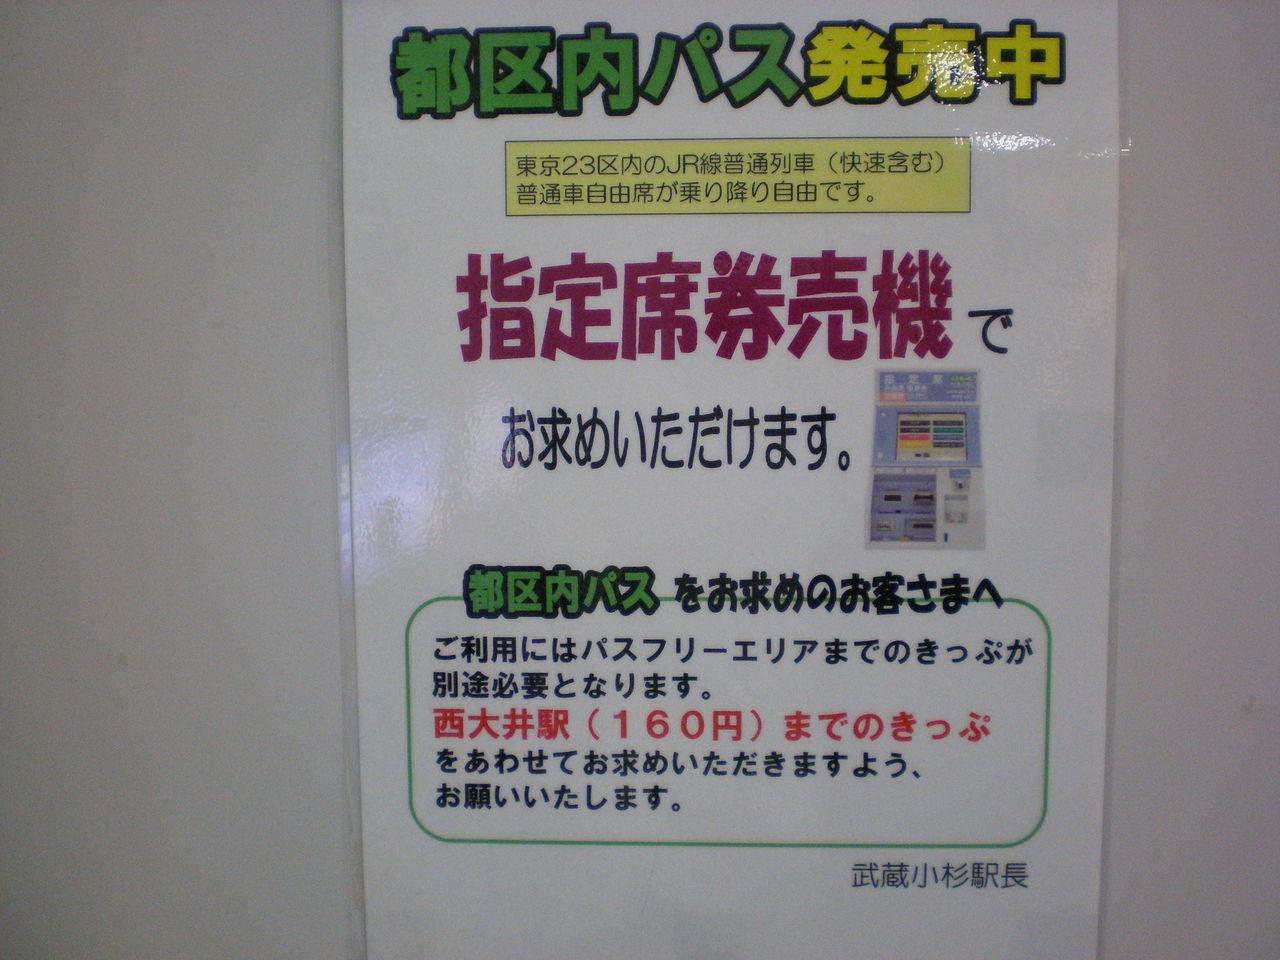 http://livedoor.blogimg.jp/yosi44125/imgs/4/3/43f0966b.jpg